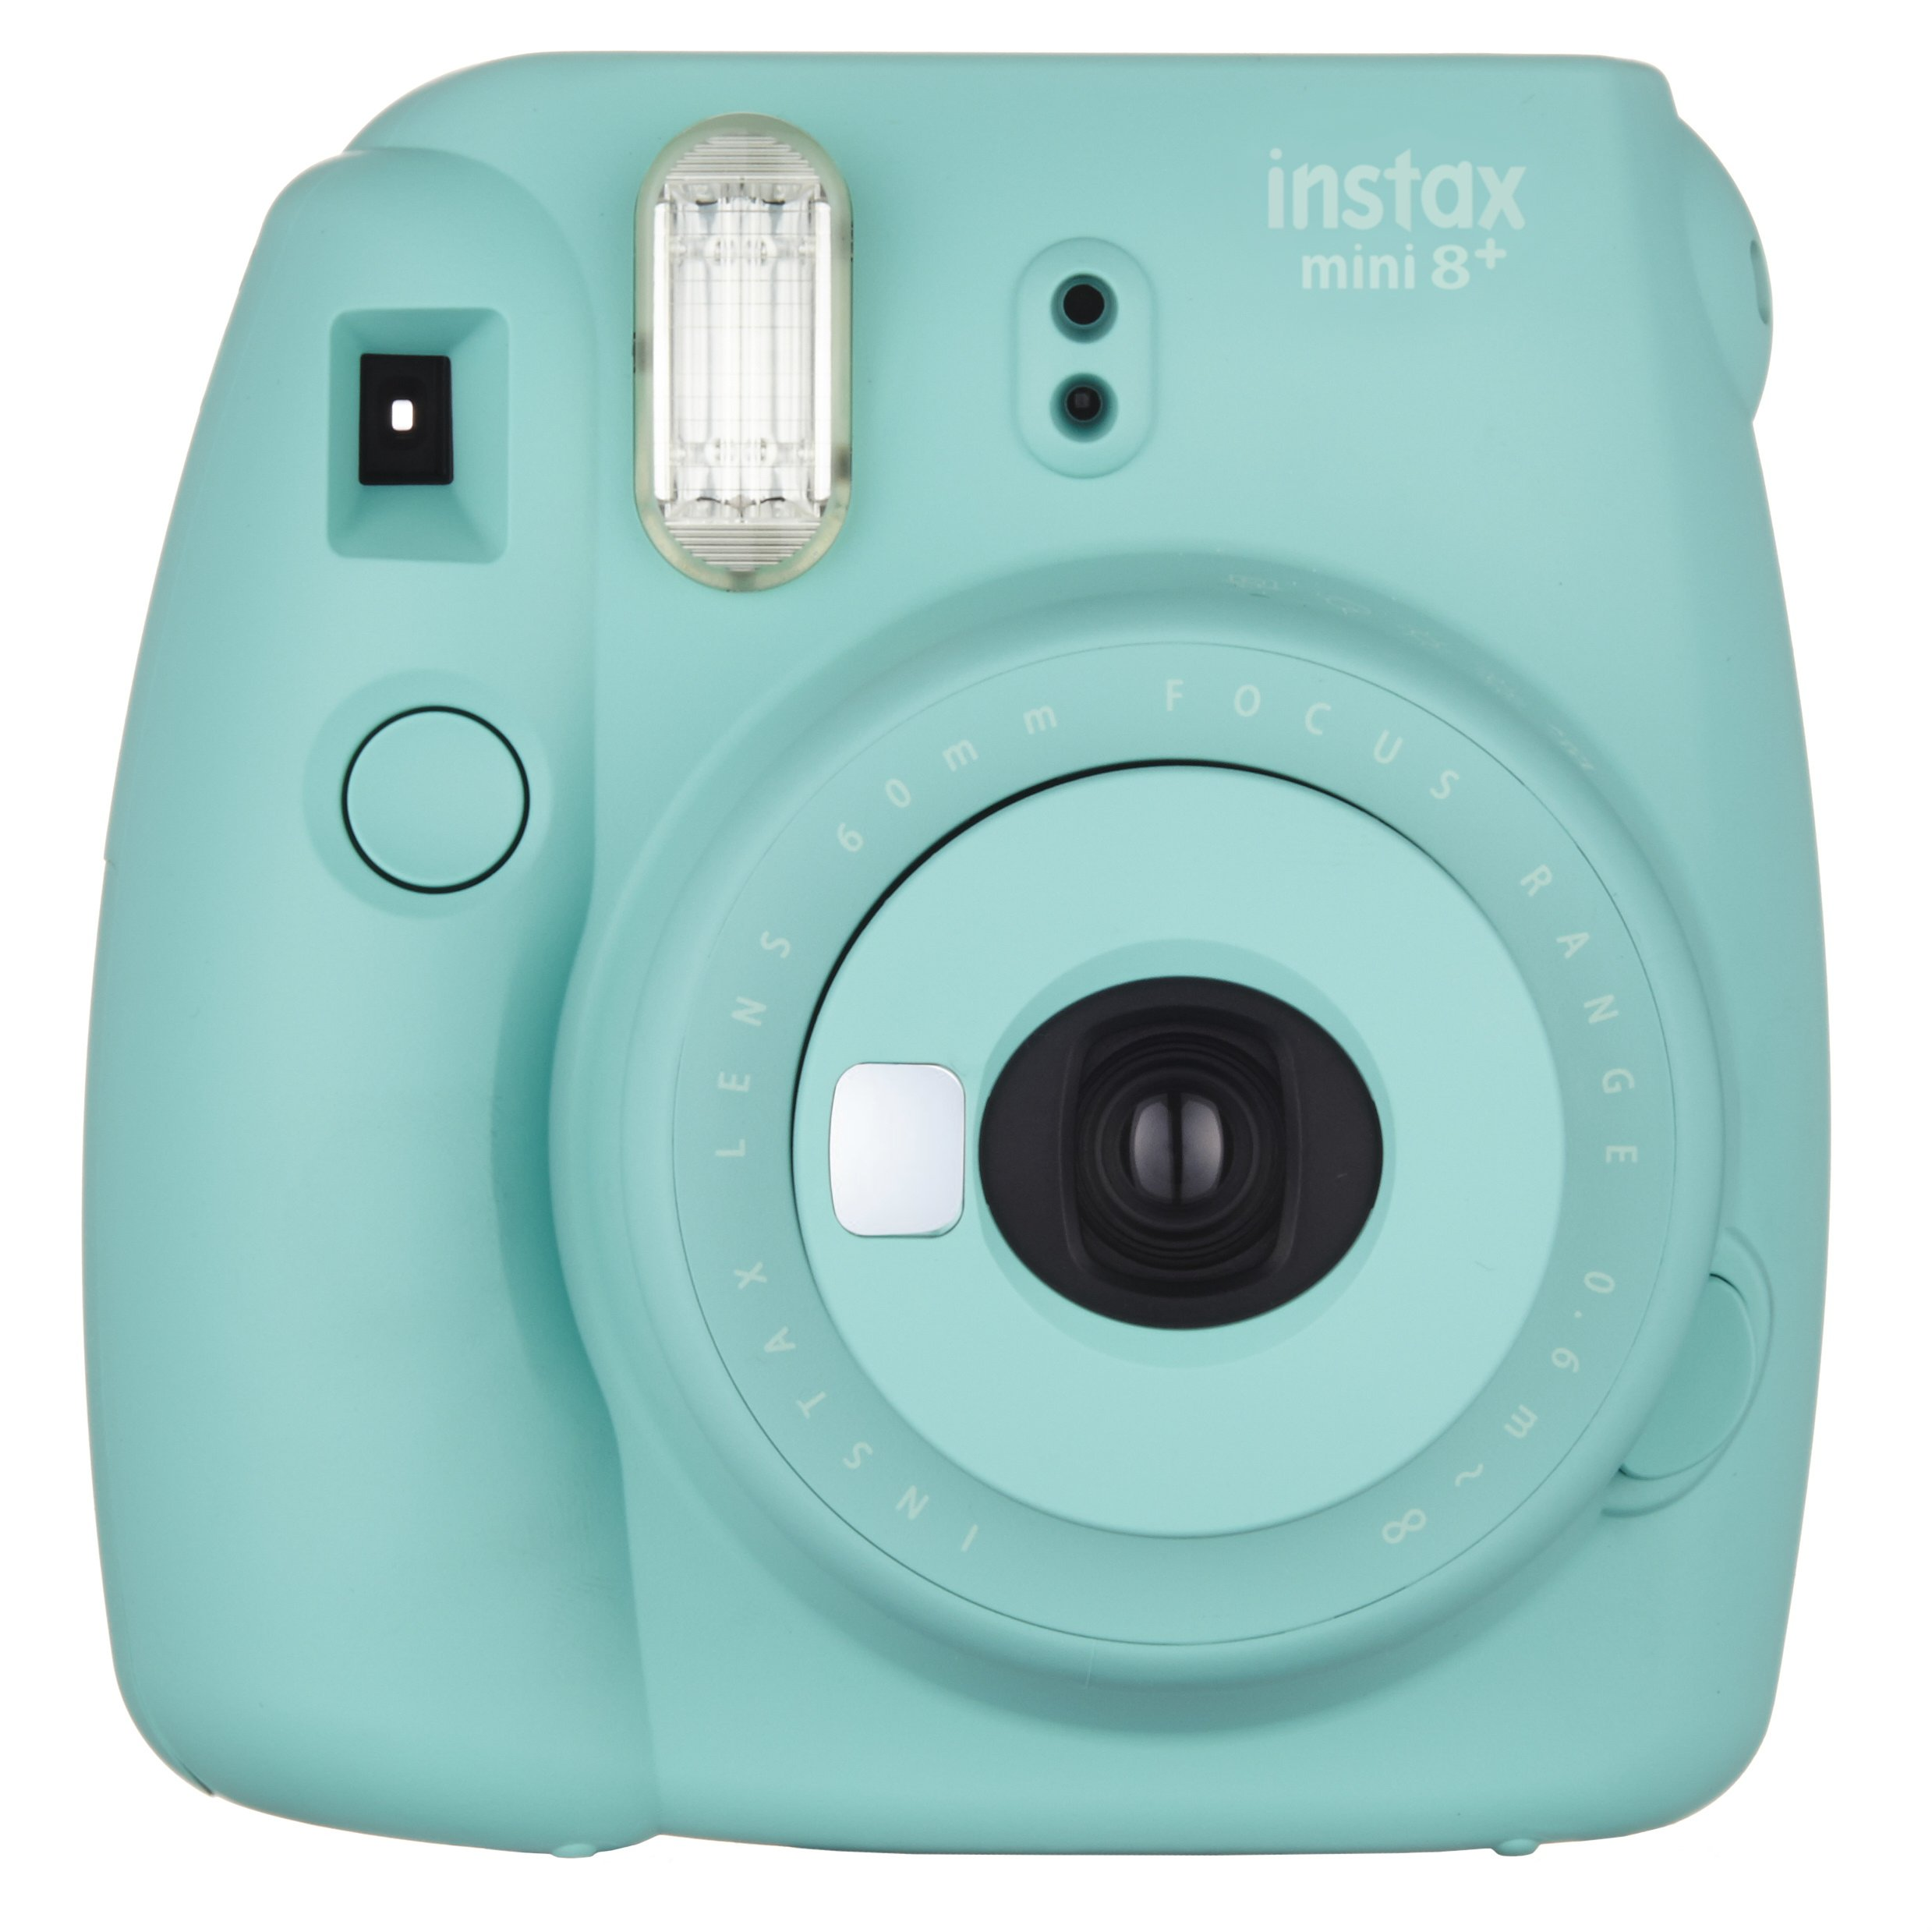 Fujifilm Instax Mini 8+ (Mint) Instant Film Camera + Self Shot Mirror for Selfie Use - International Version (No Warranty) by Fujifilm